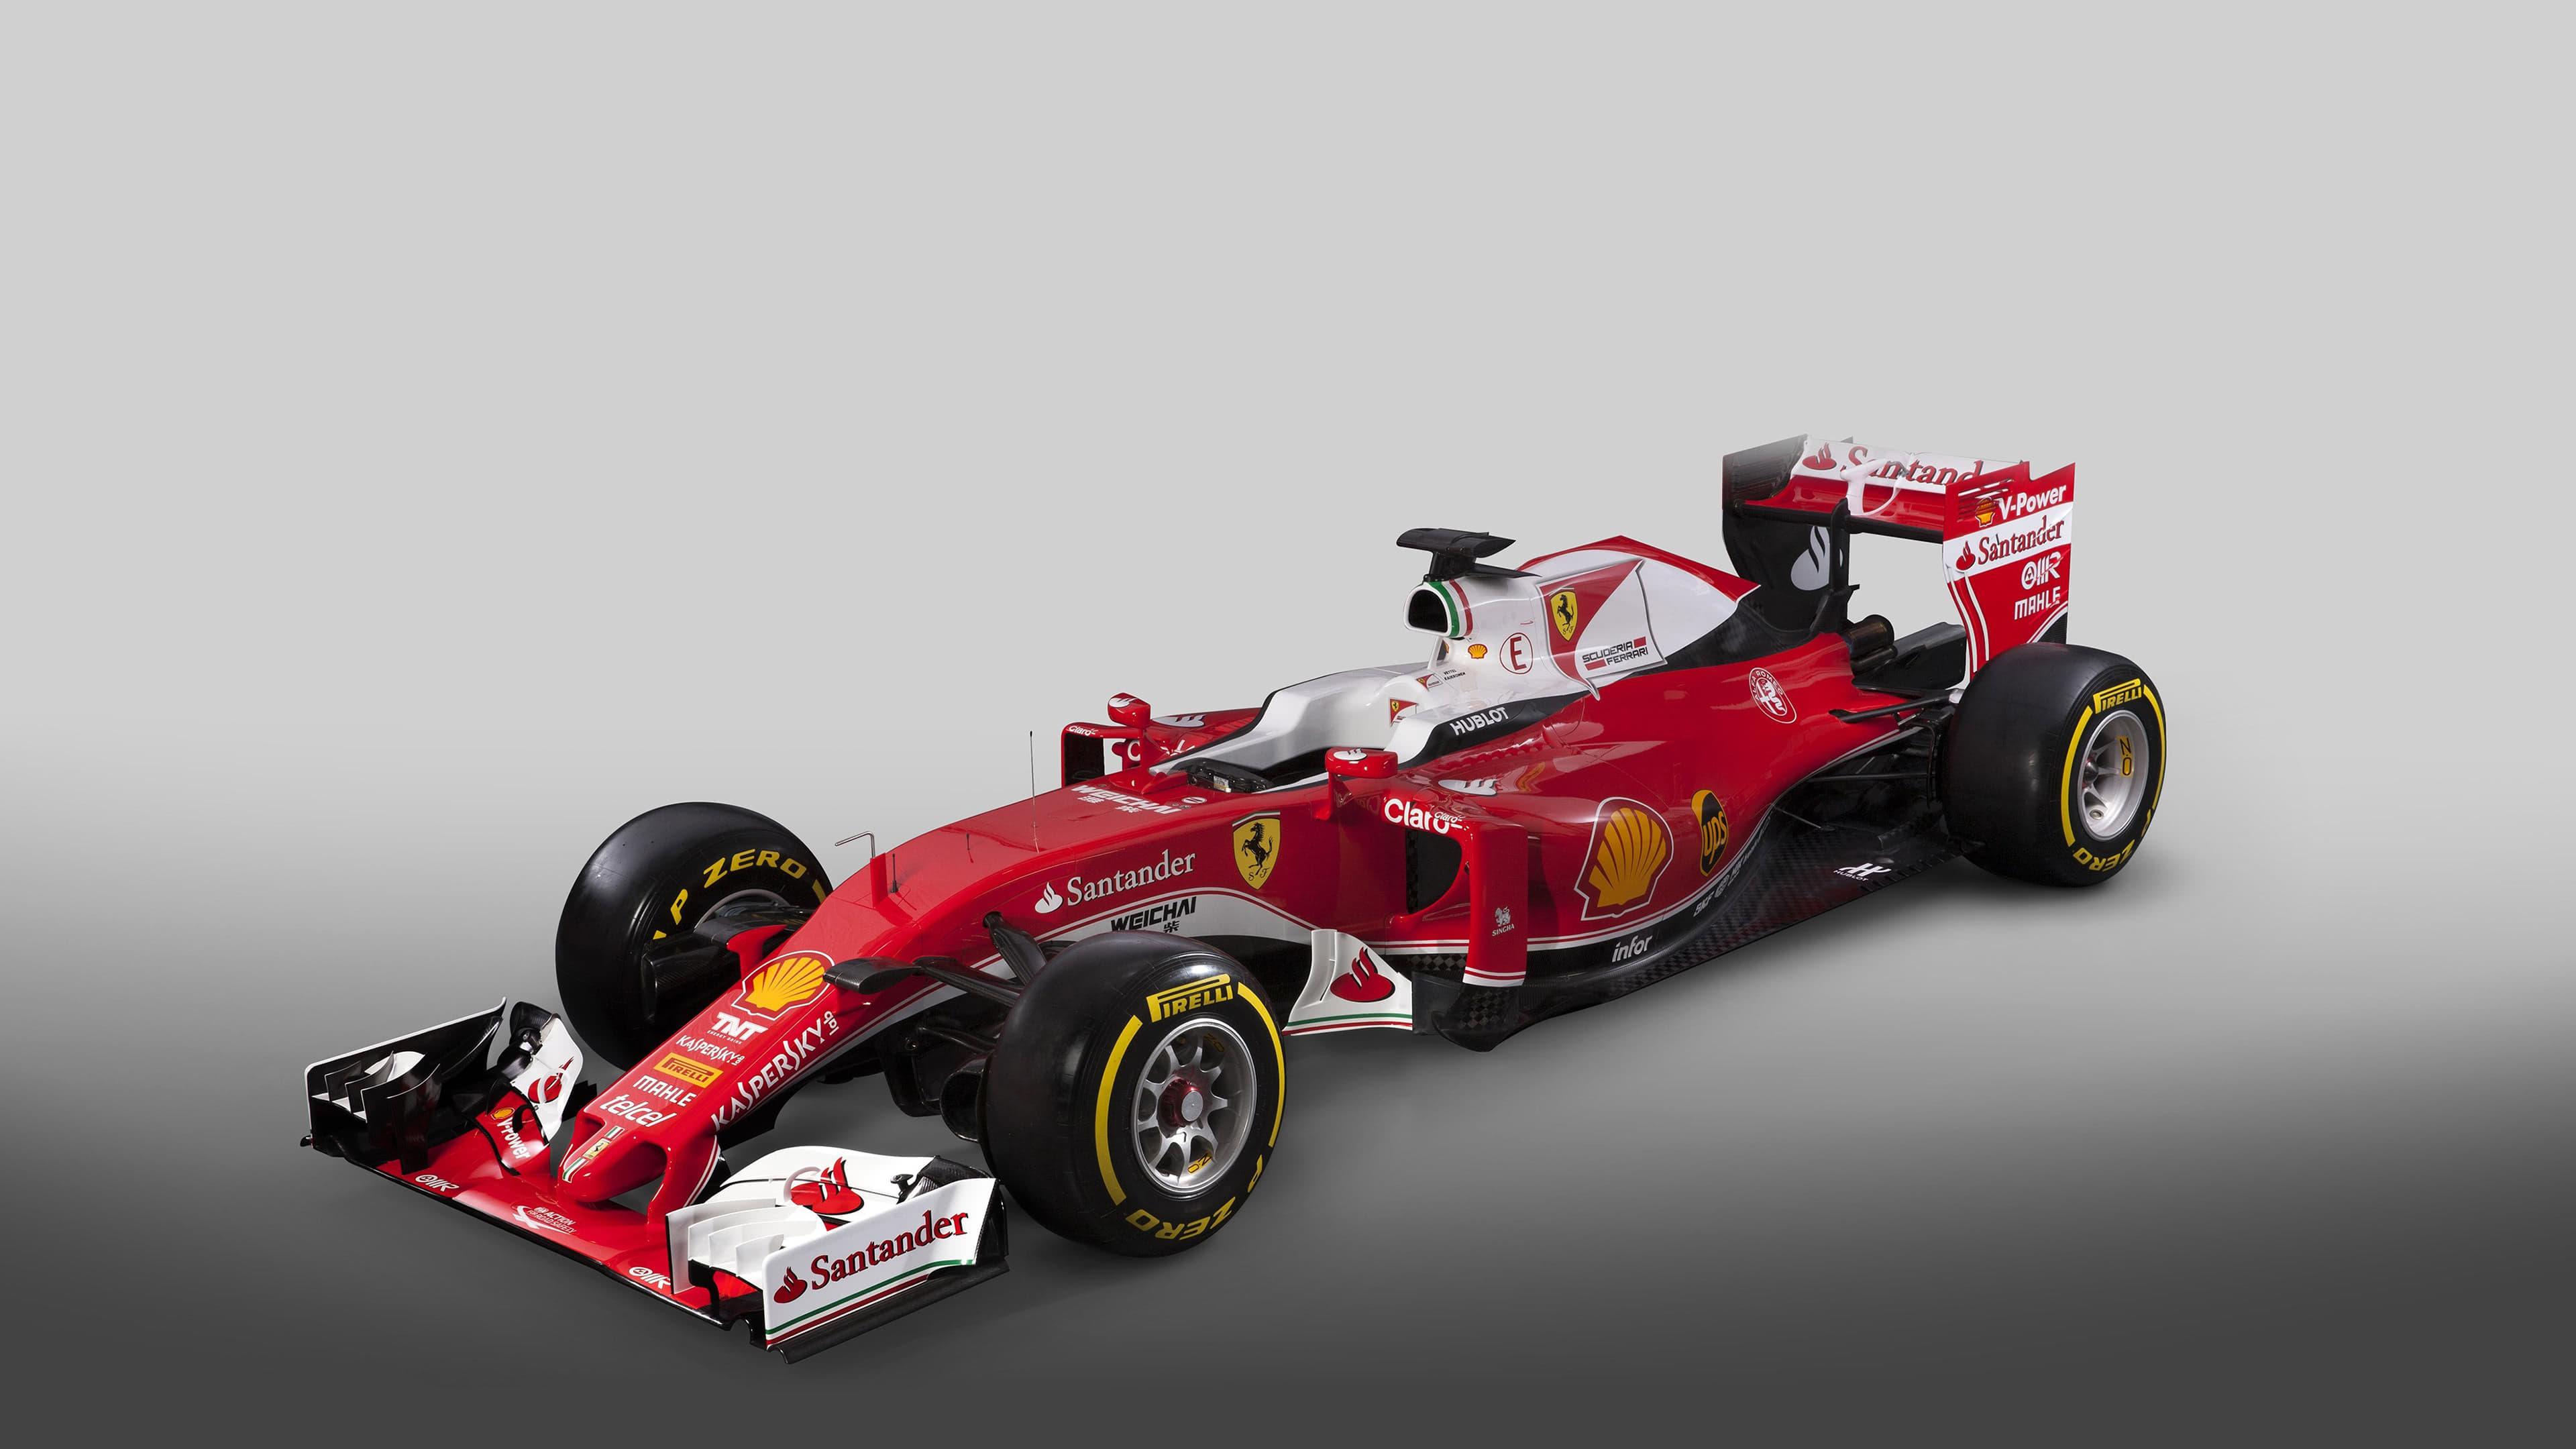 Ferrari Sf16 H F1 Uhd 4k Wallpaper 3840x2160 Download Hd Wallpaper Wallpapertip